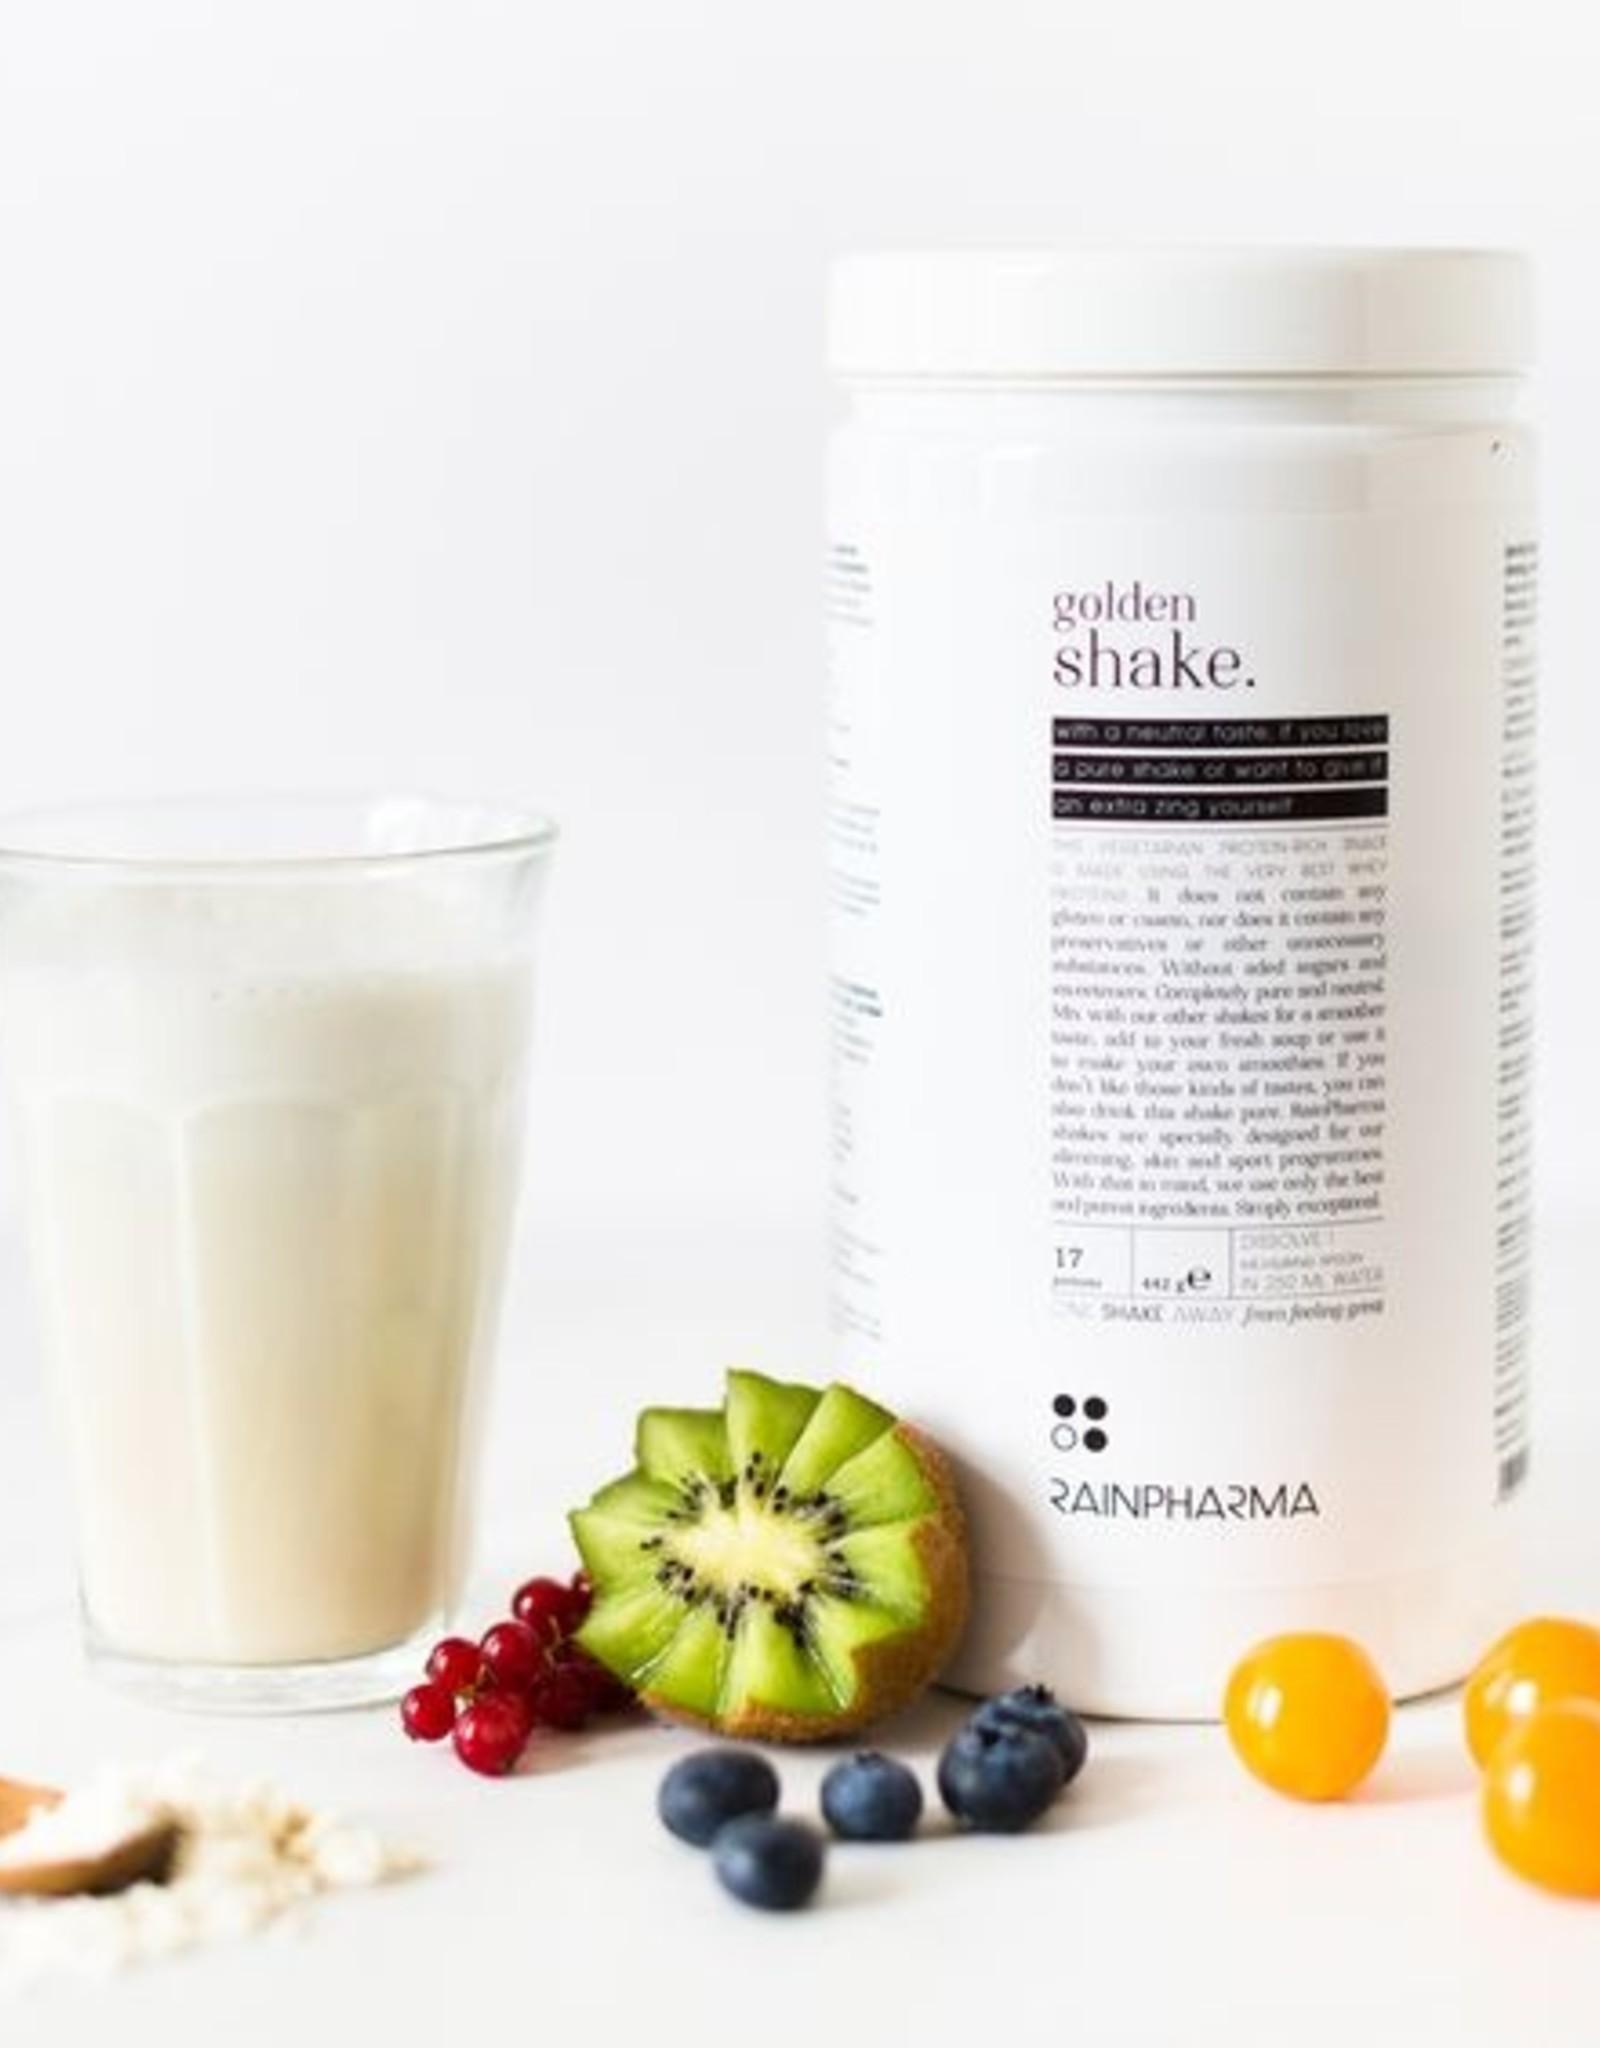 RainPharma Rainpharma - Golden Shake